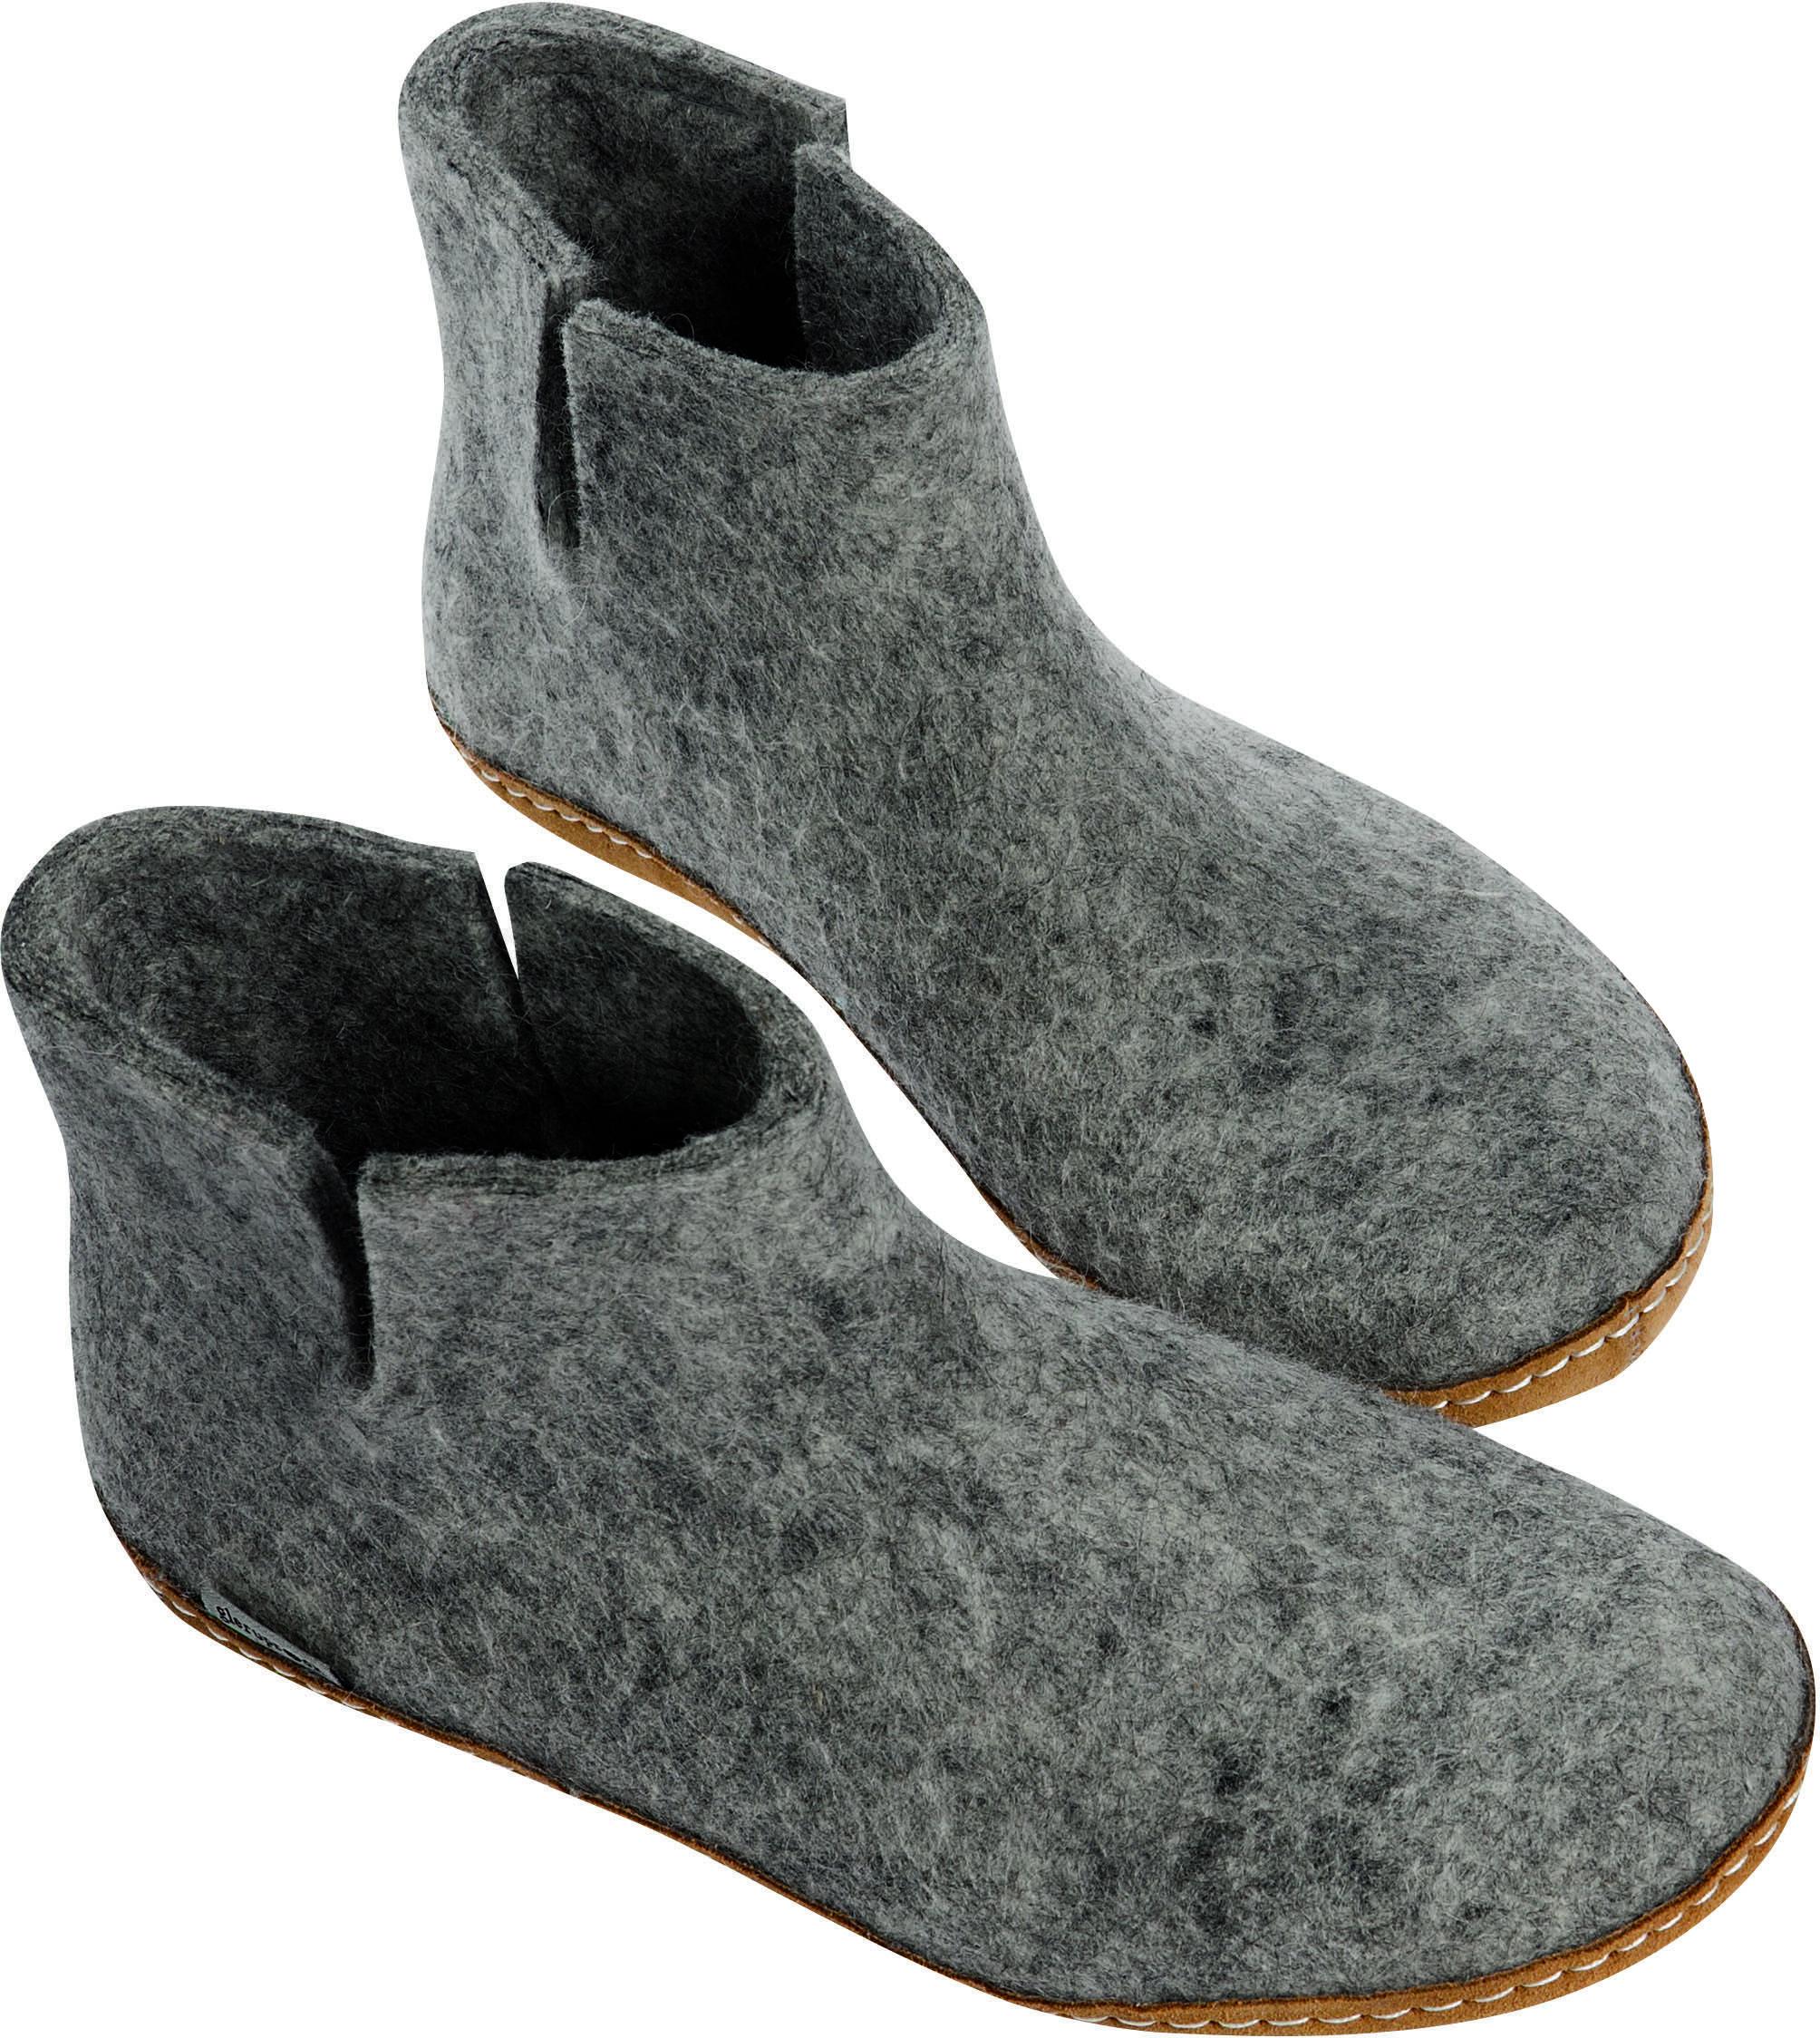 de6852f5f047 ... Glerups Unisex G-01 - Felt Boots ·  https   www.theshoemart.com product images images GLE